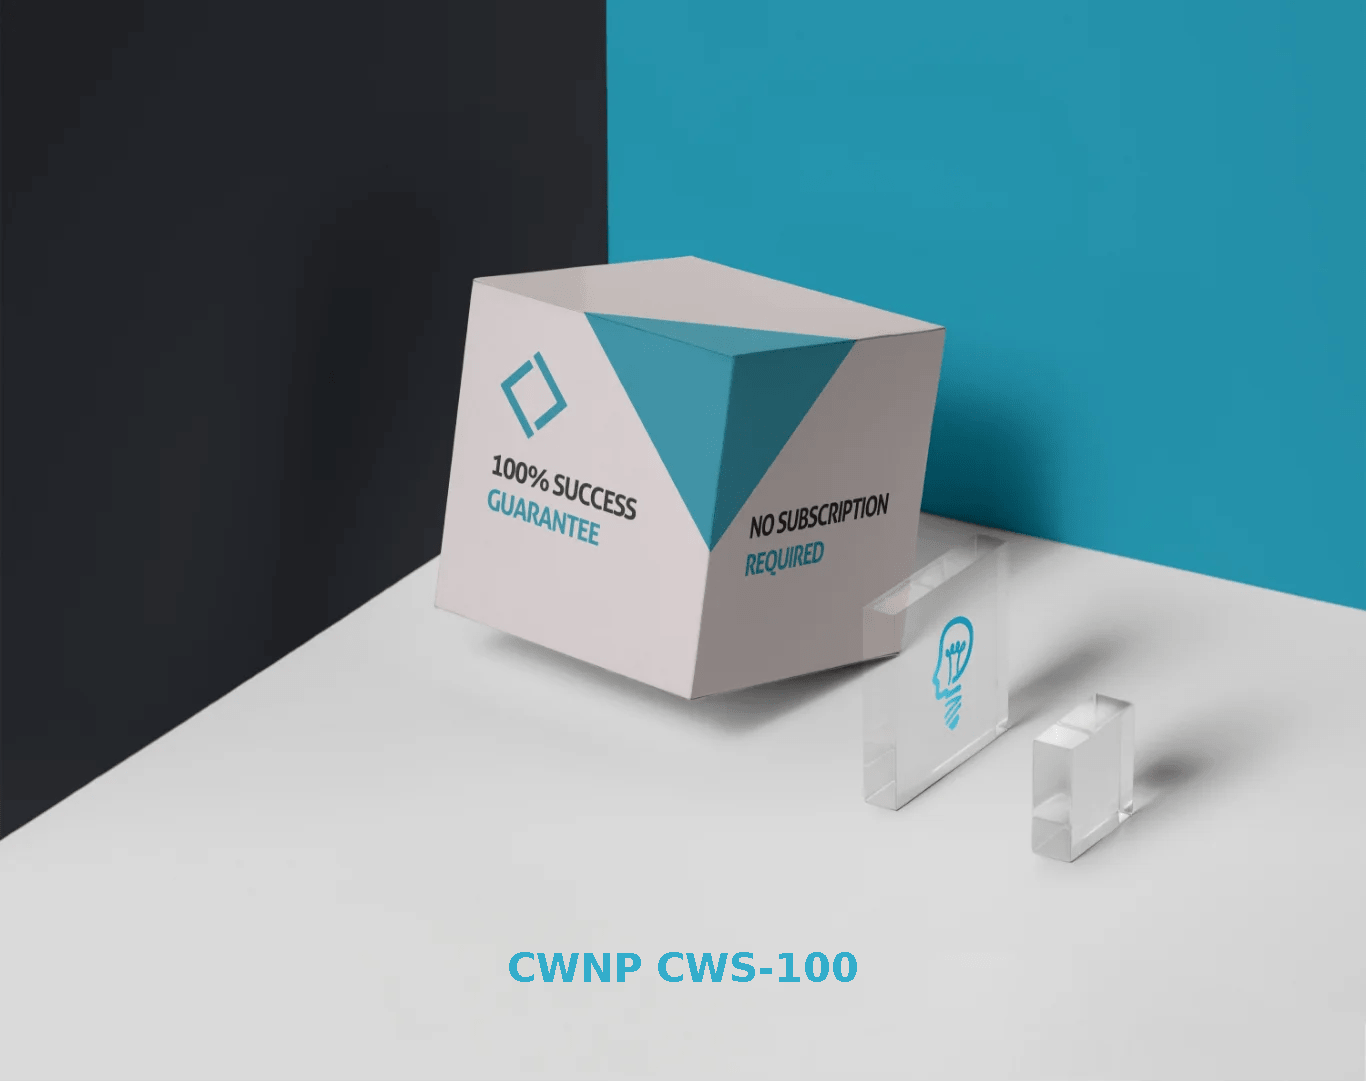 CWNP CWS-100 Exams